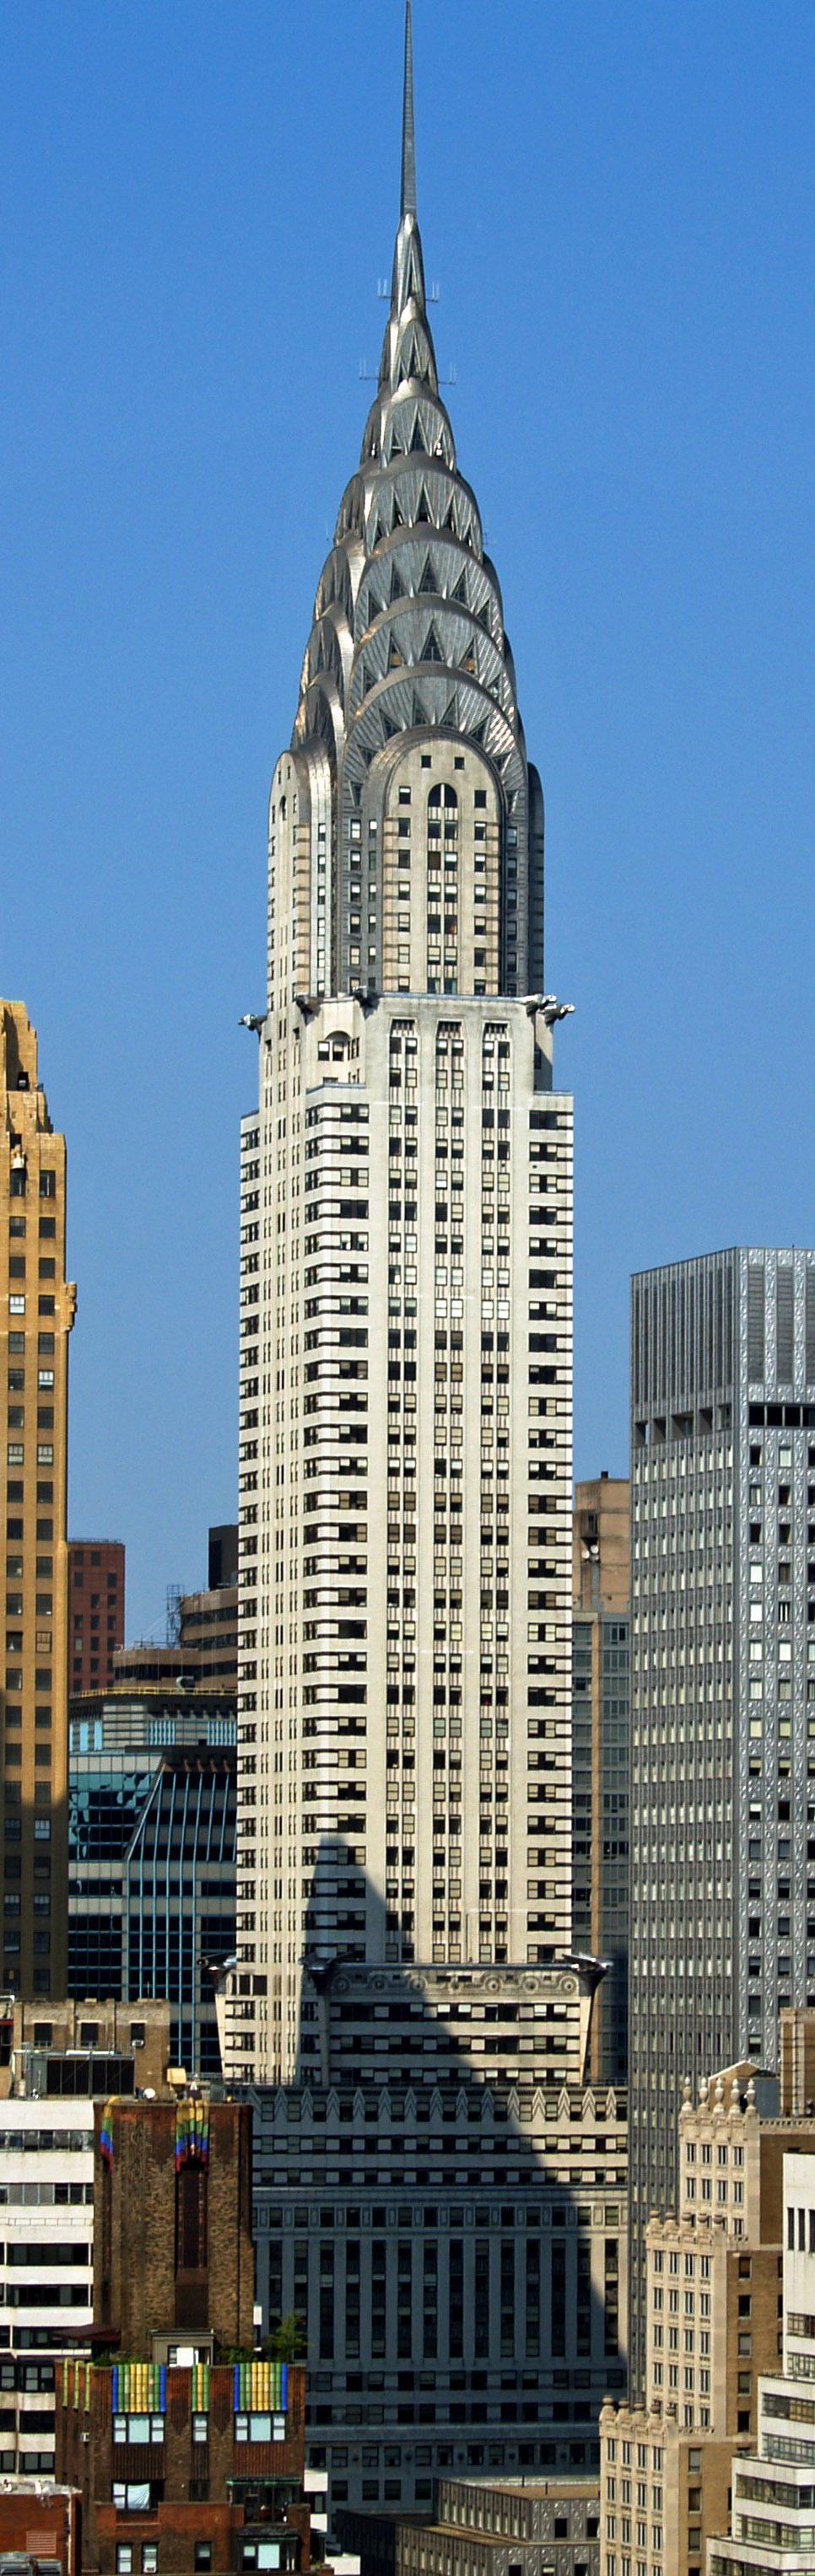 Van Alen, The Chrysler Building (article) | Khan Academy